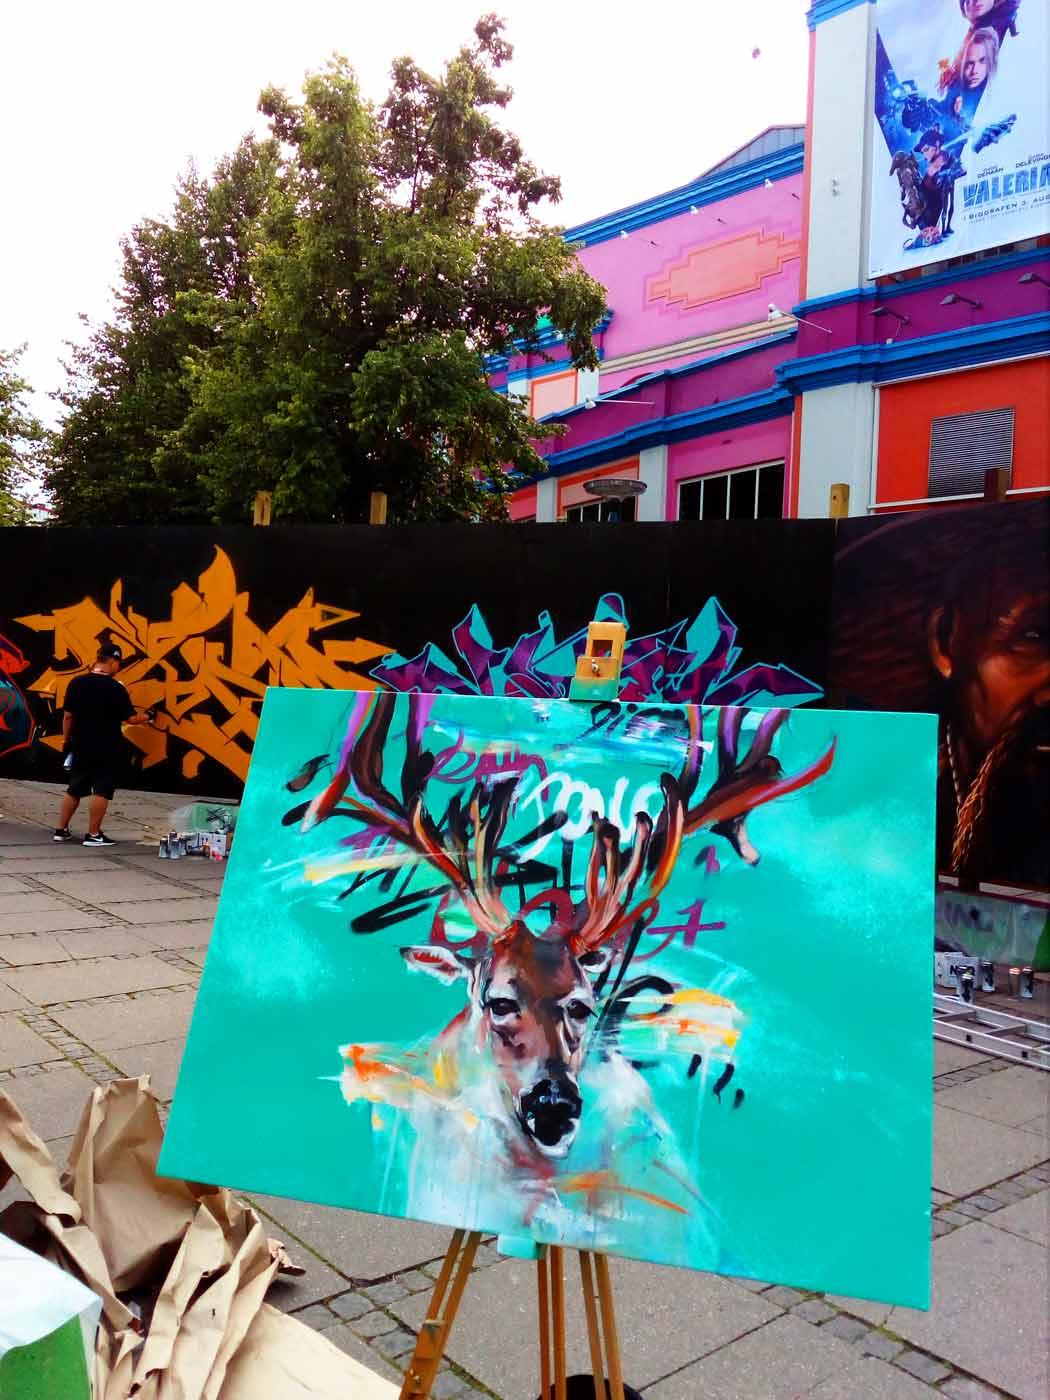 Live graffiti